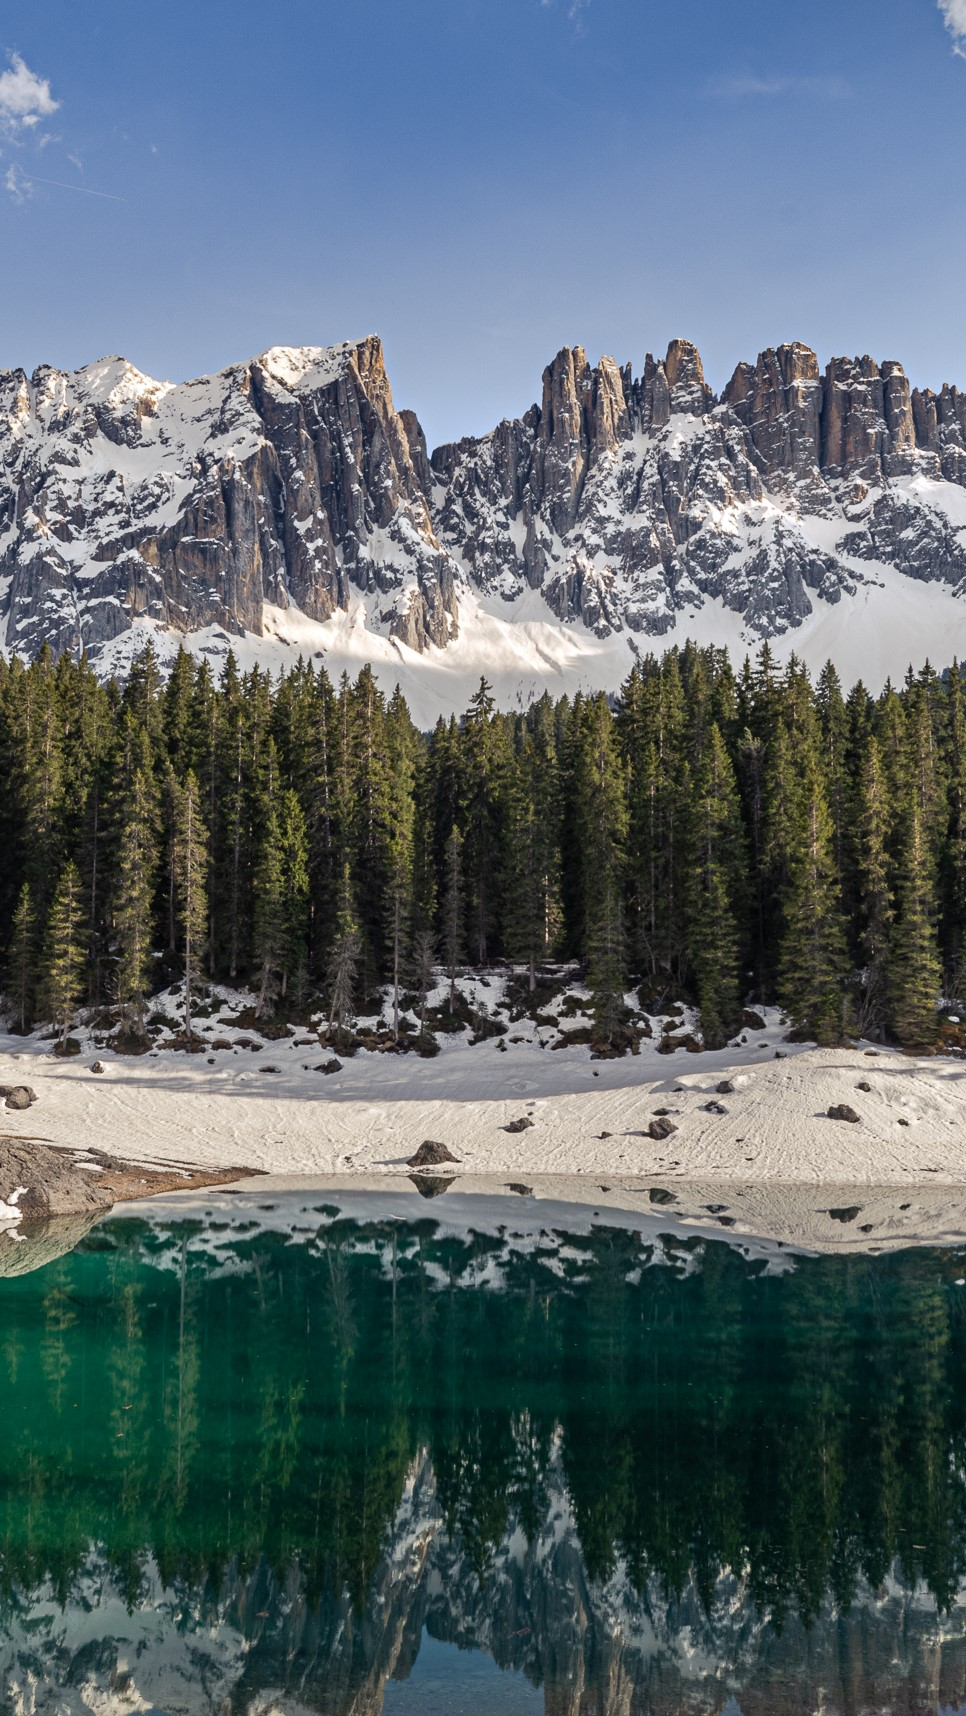 beautiful lake landscape photo lock screen wallpaper for phone